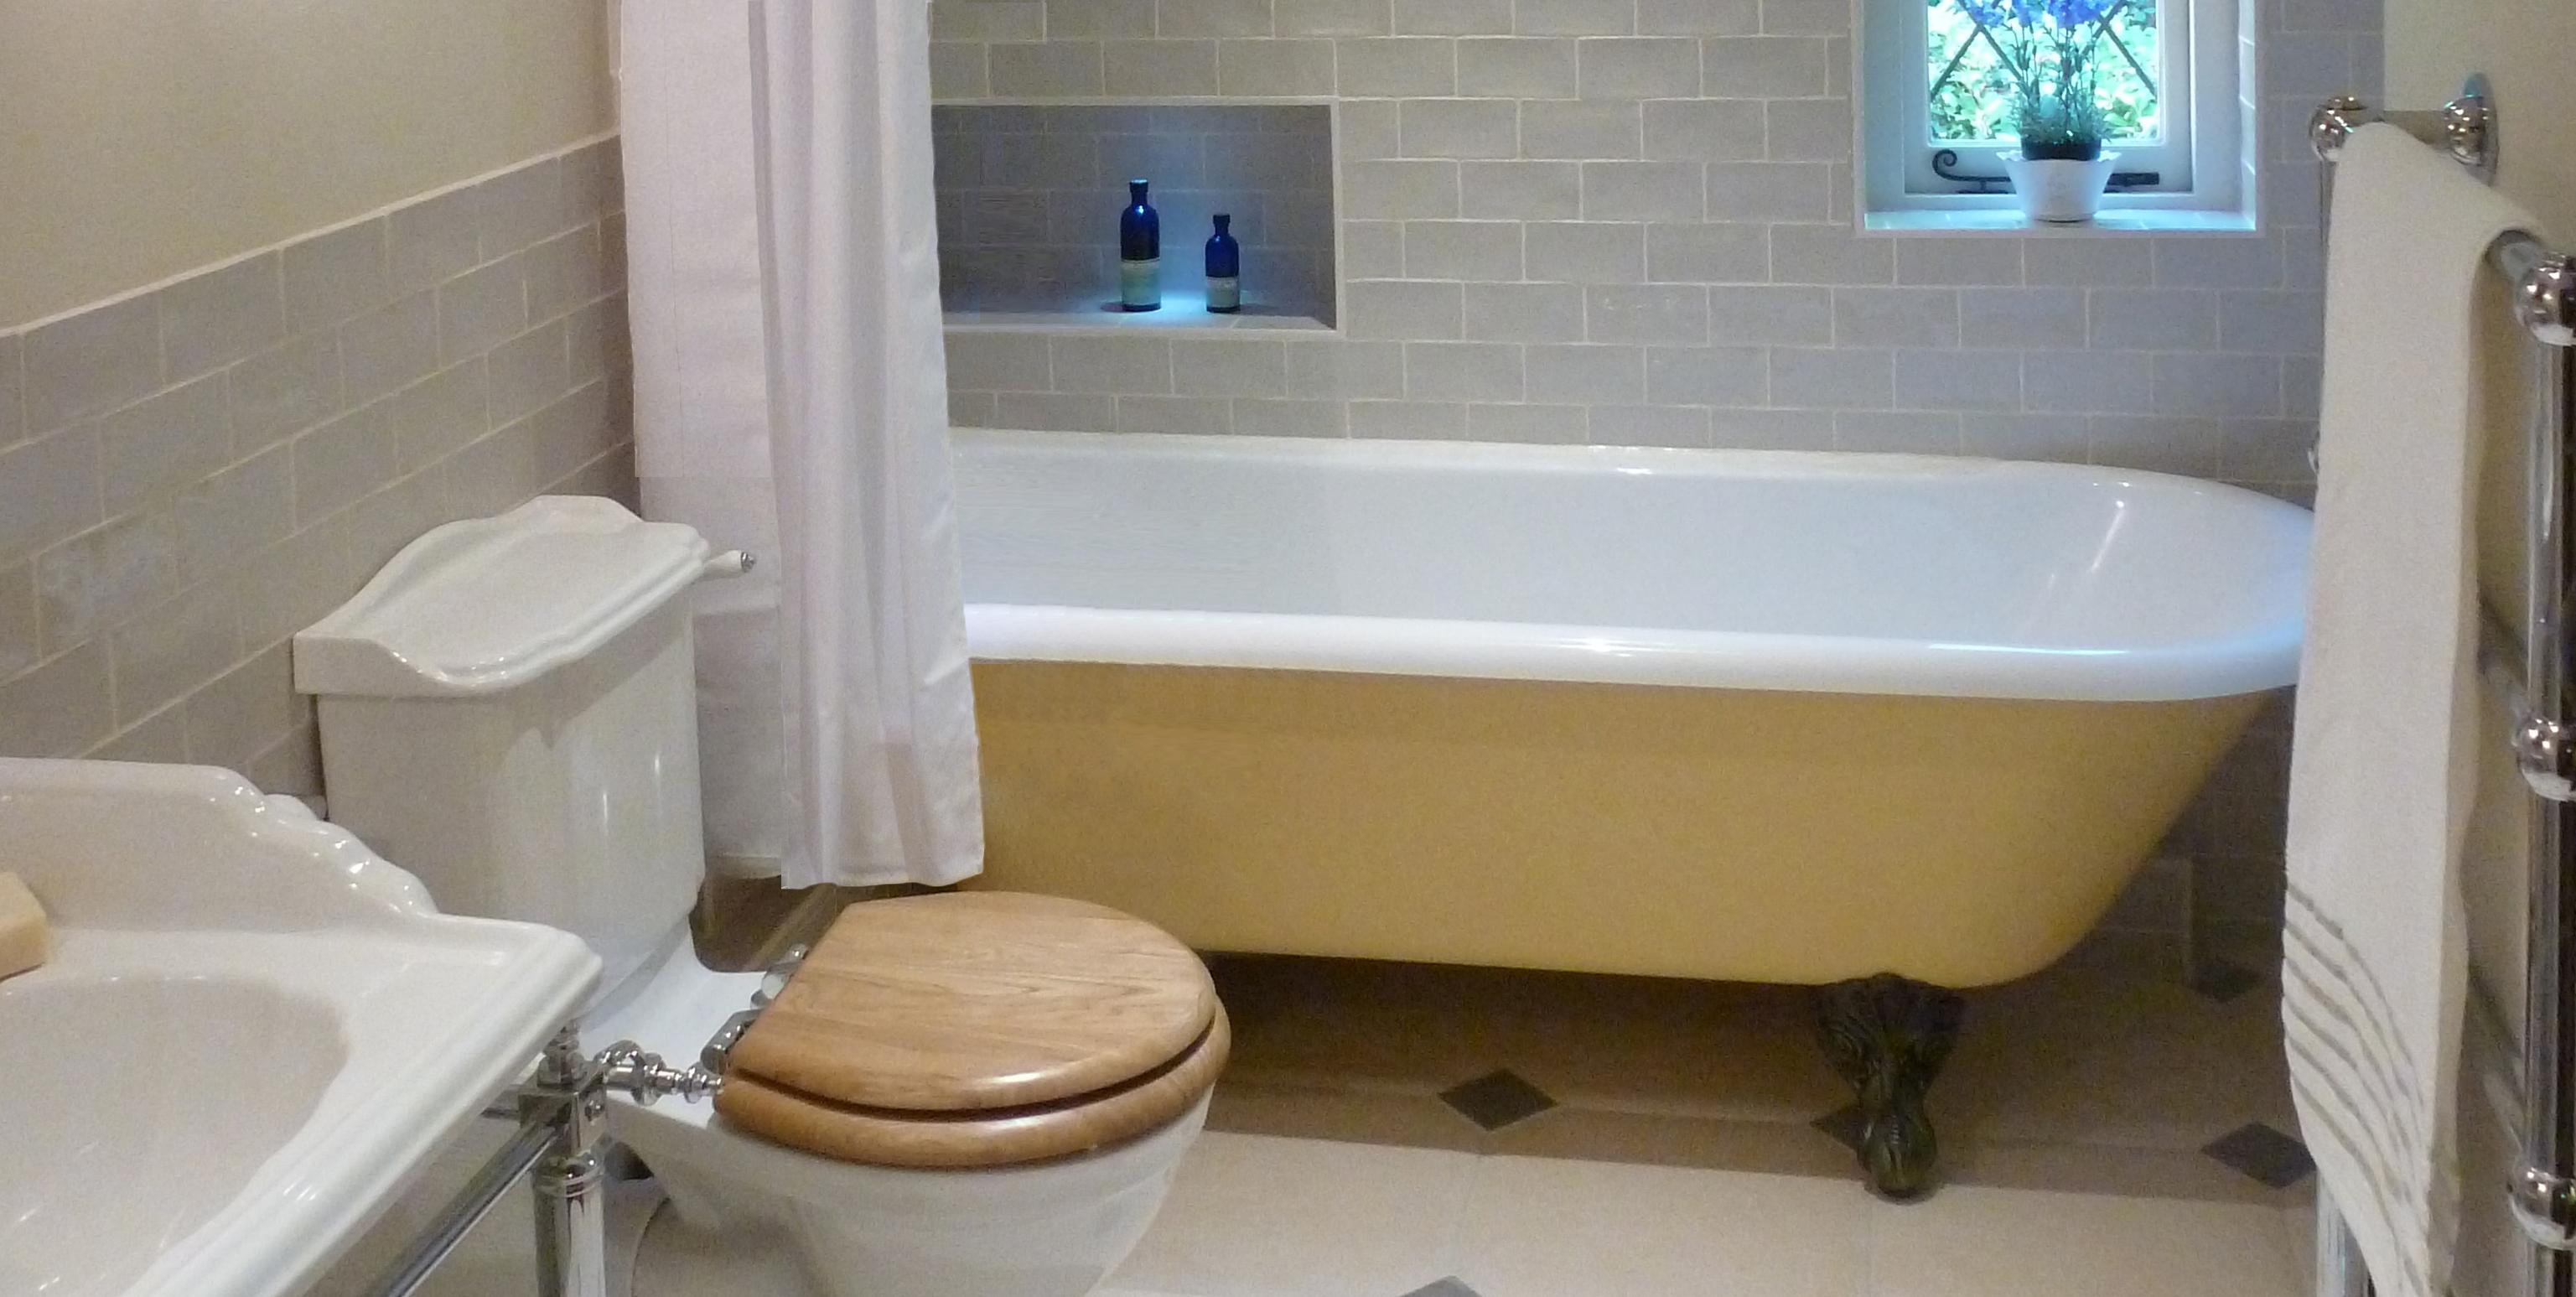 Reading Bathroom Showroom 28 Images Real Deal Bathrooms Groundfloorfrontgroundfloorfront